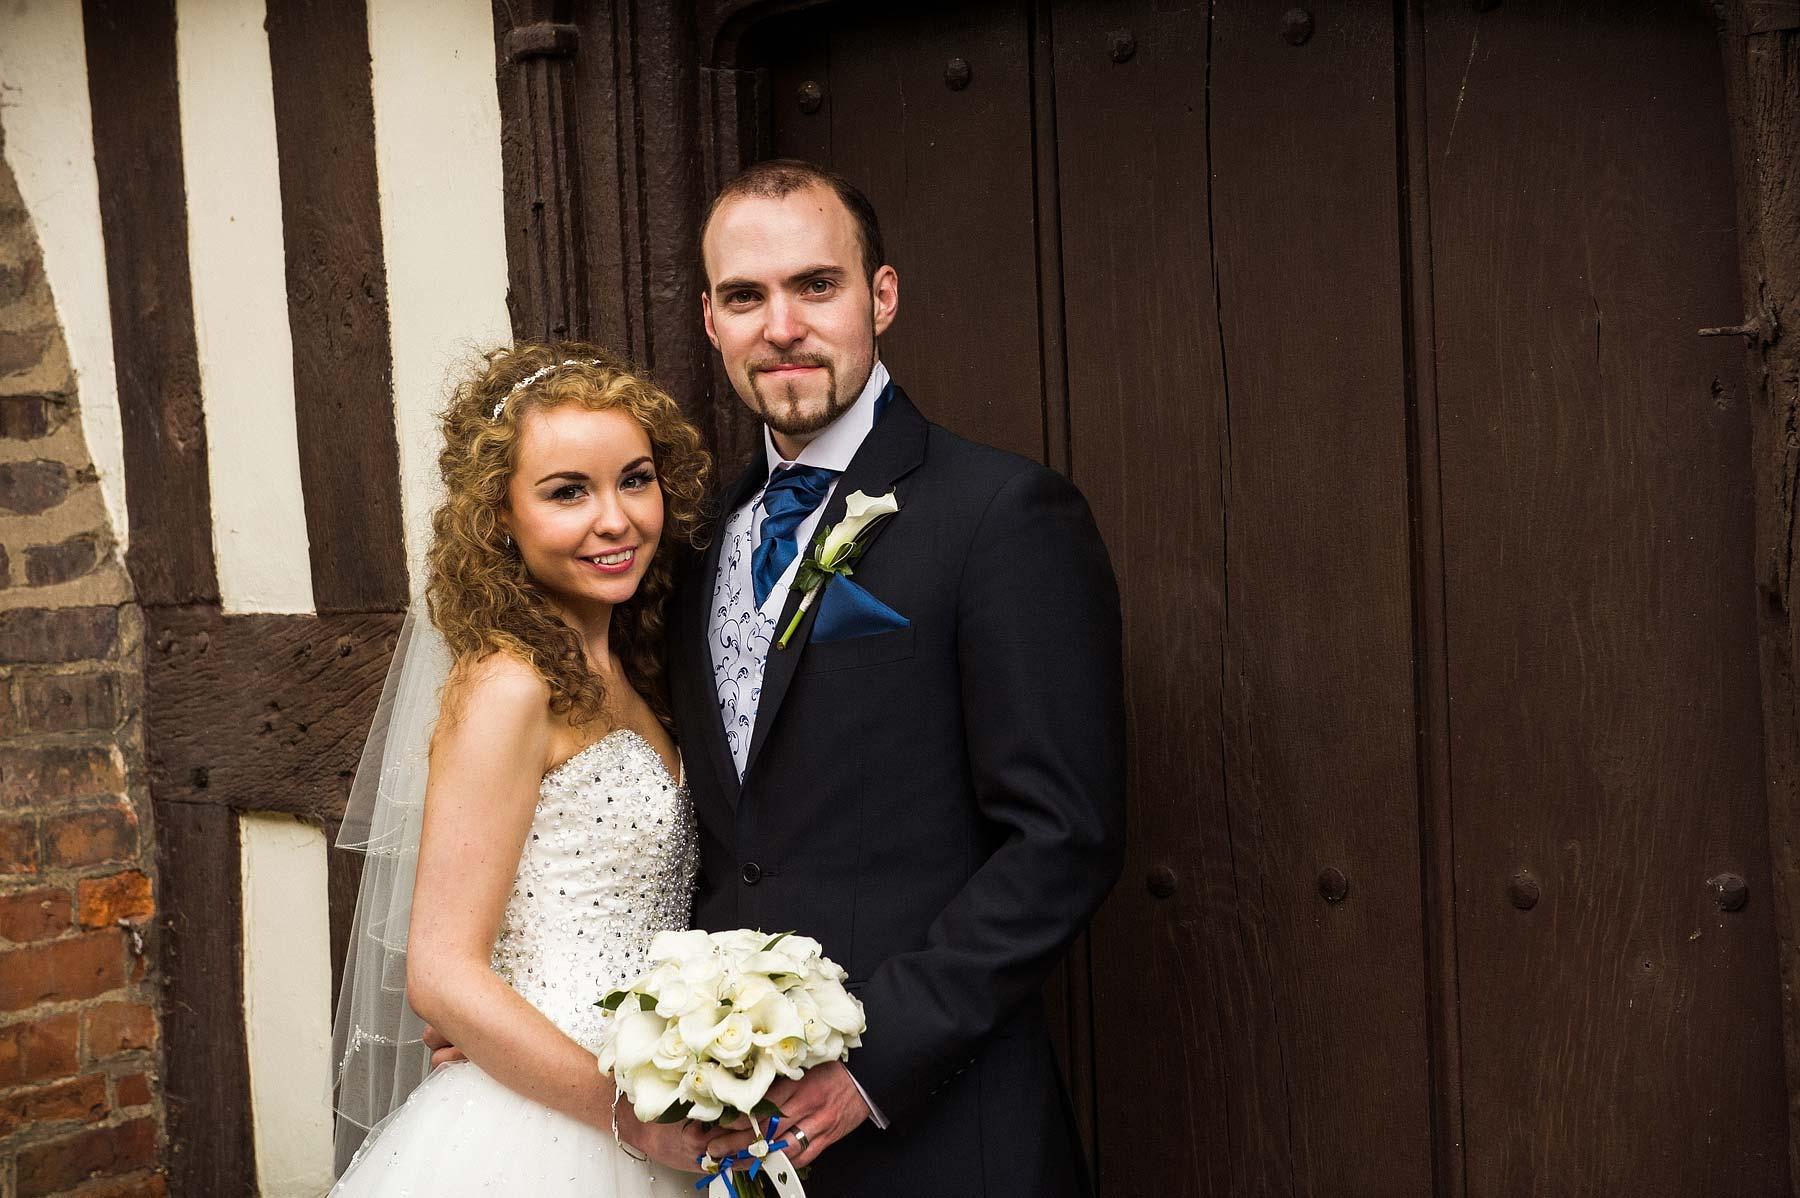 albright-hussey-manor-wedding-photographers-041